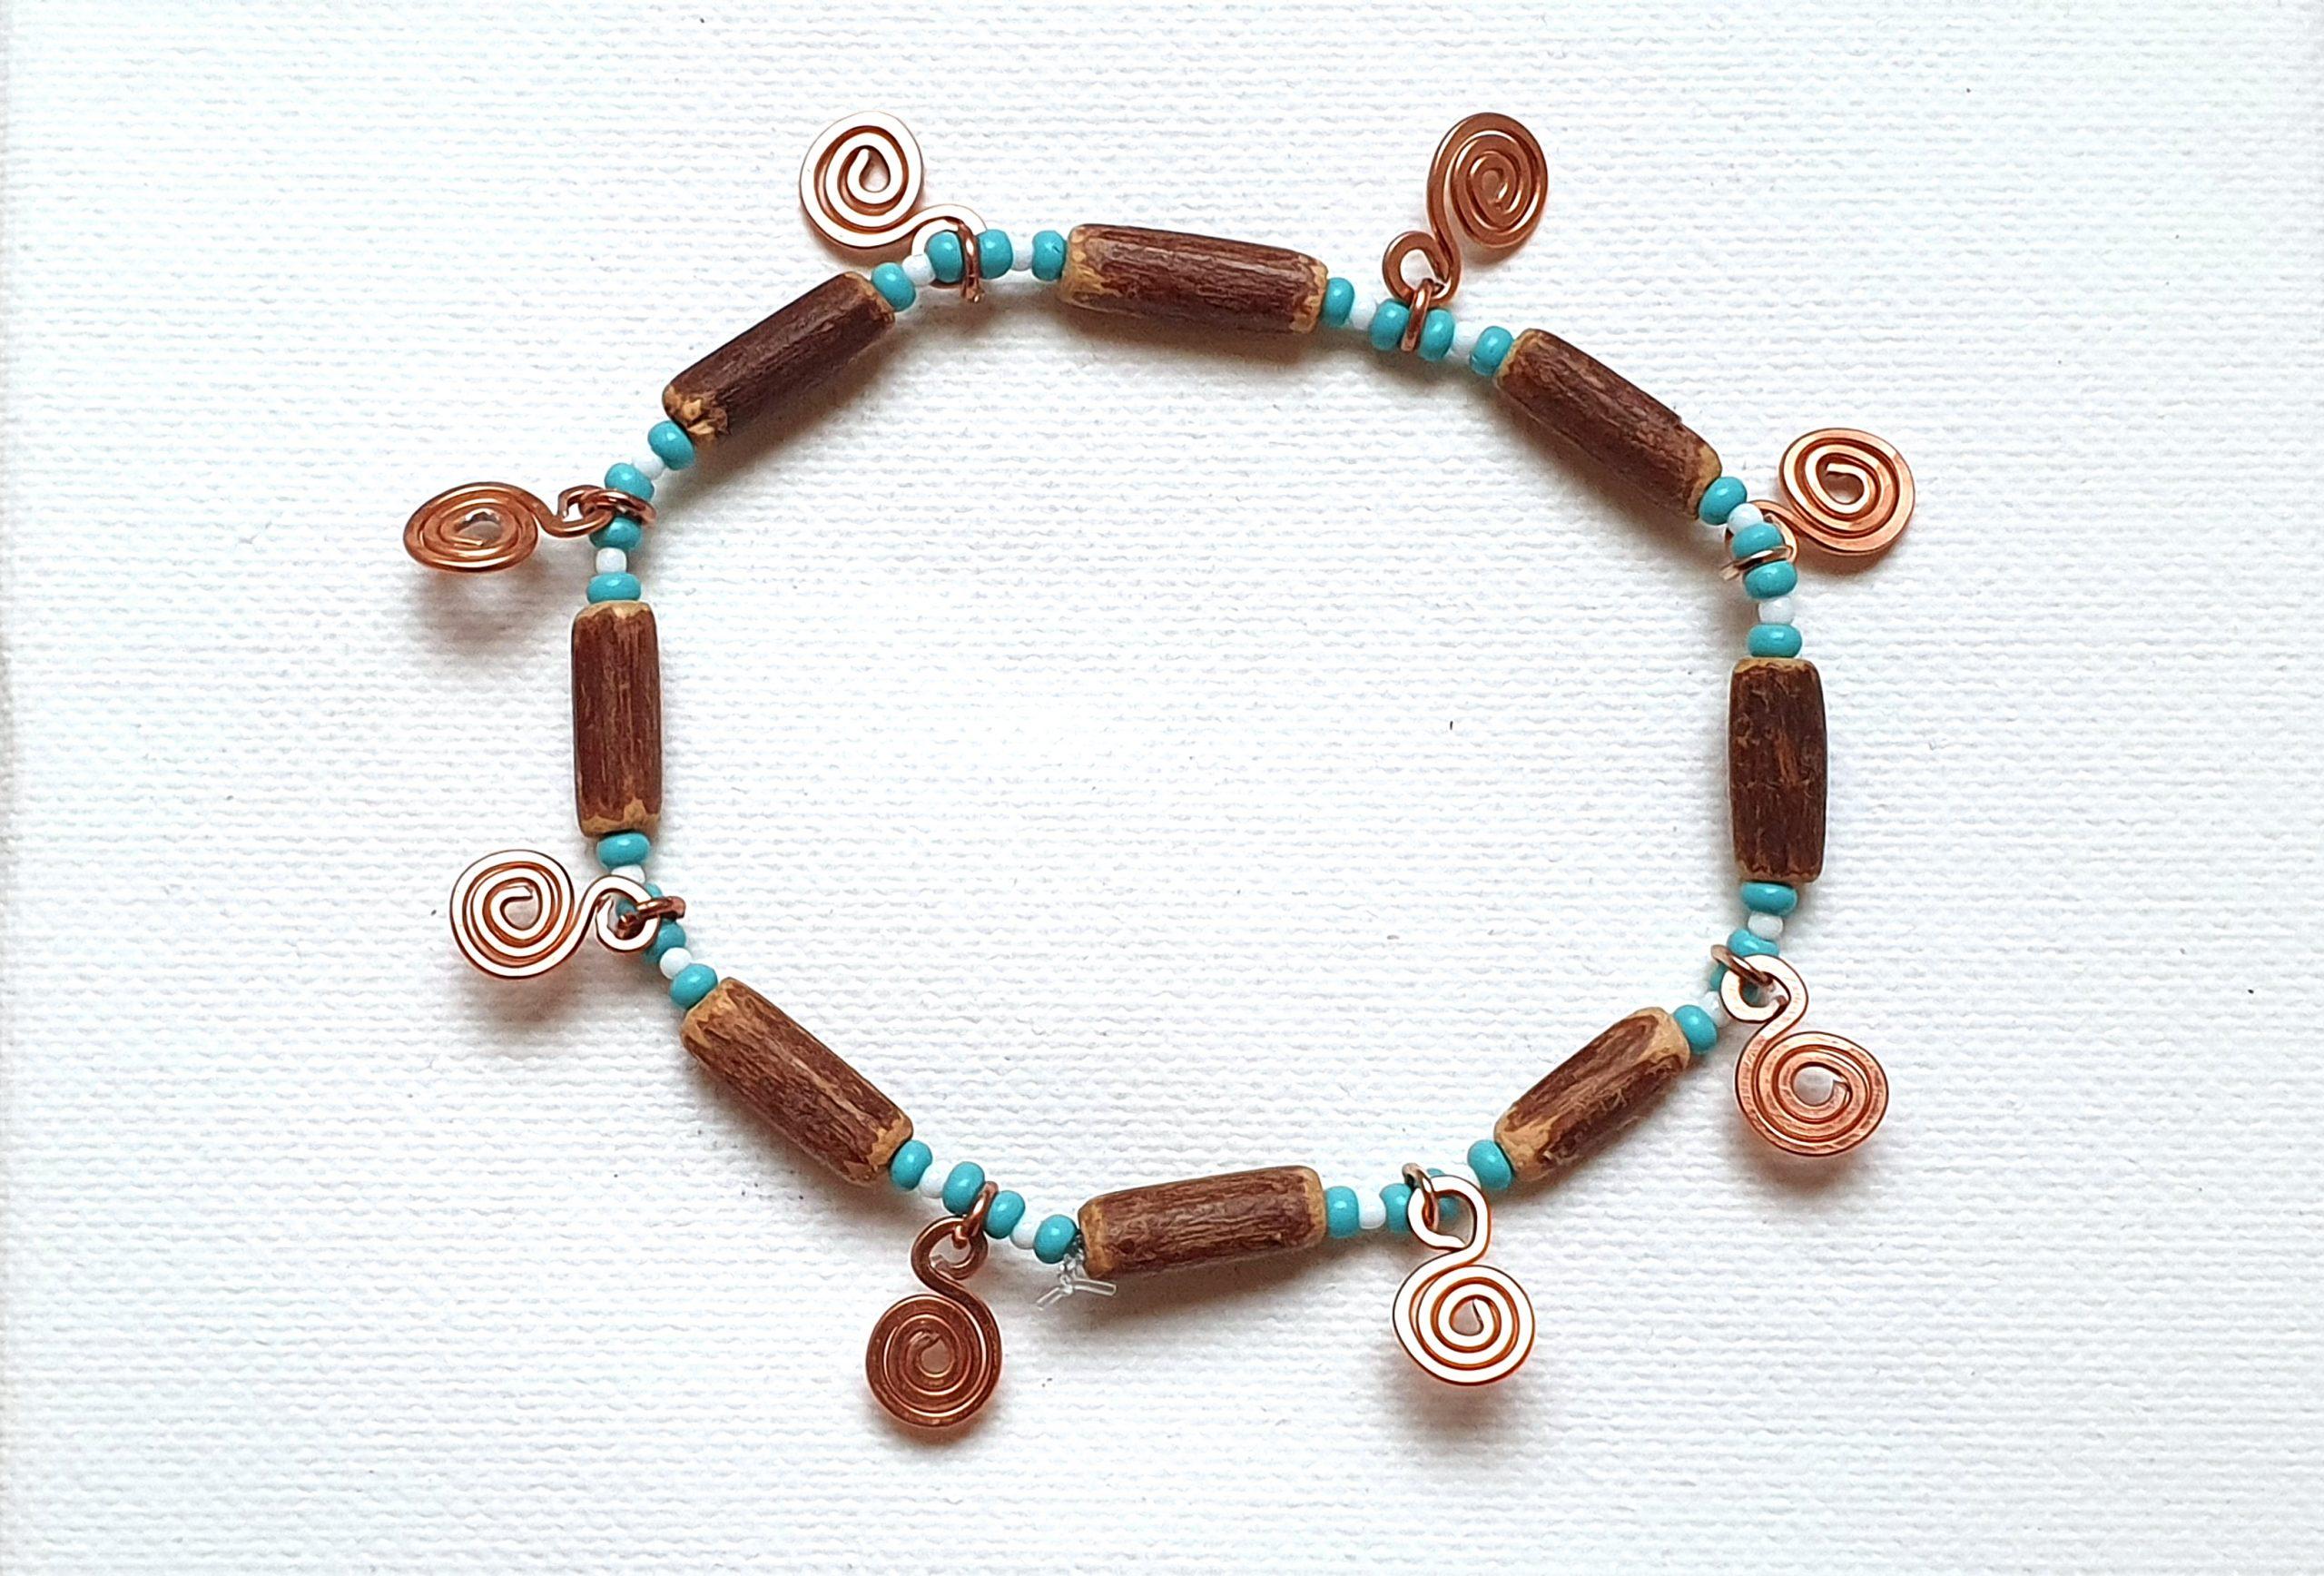 Armbändchen/bracelets by Calla, Claudie Hamburg, Claudie Hüppe